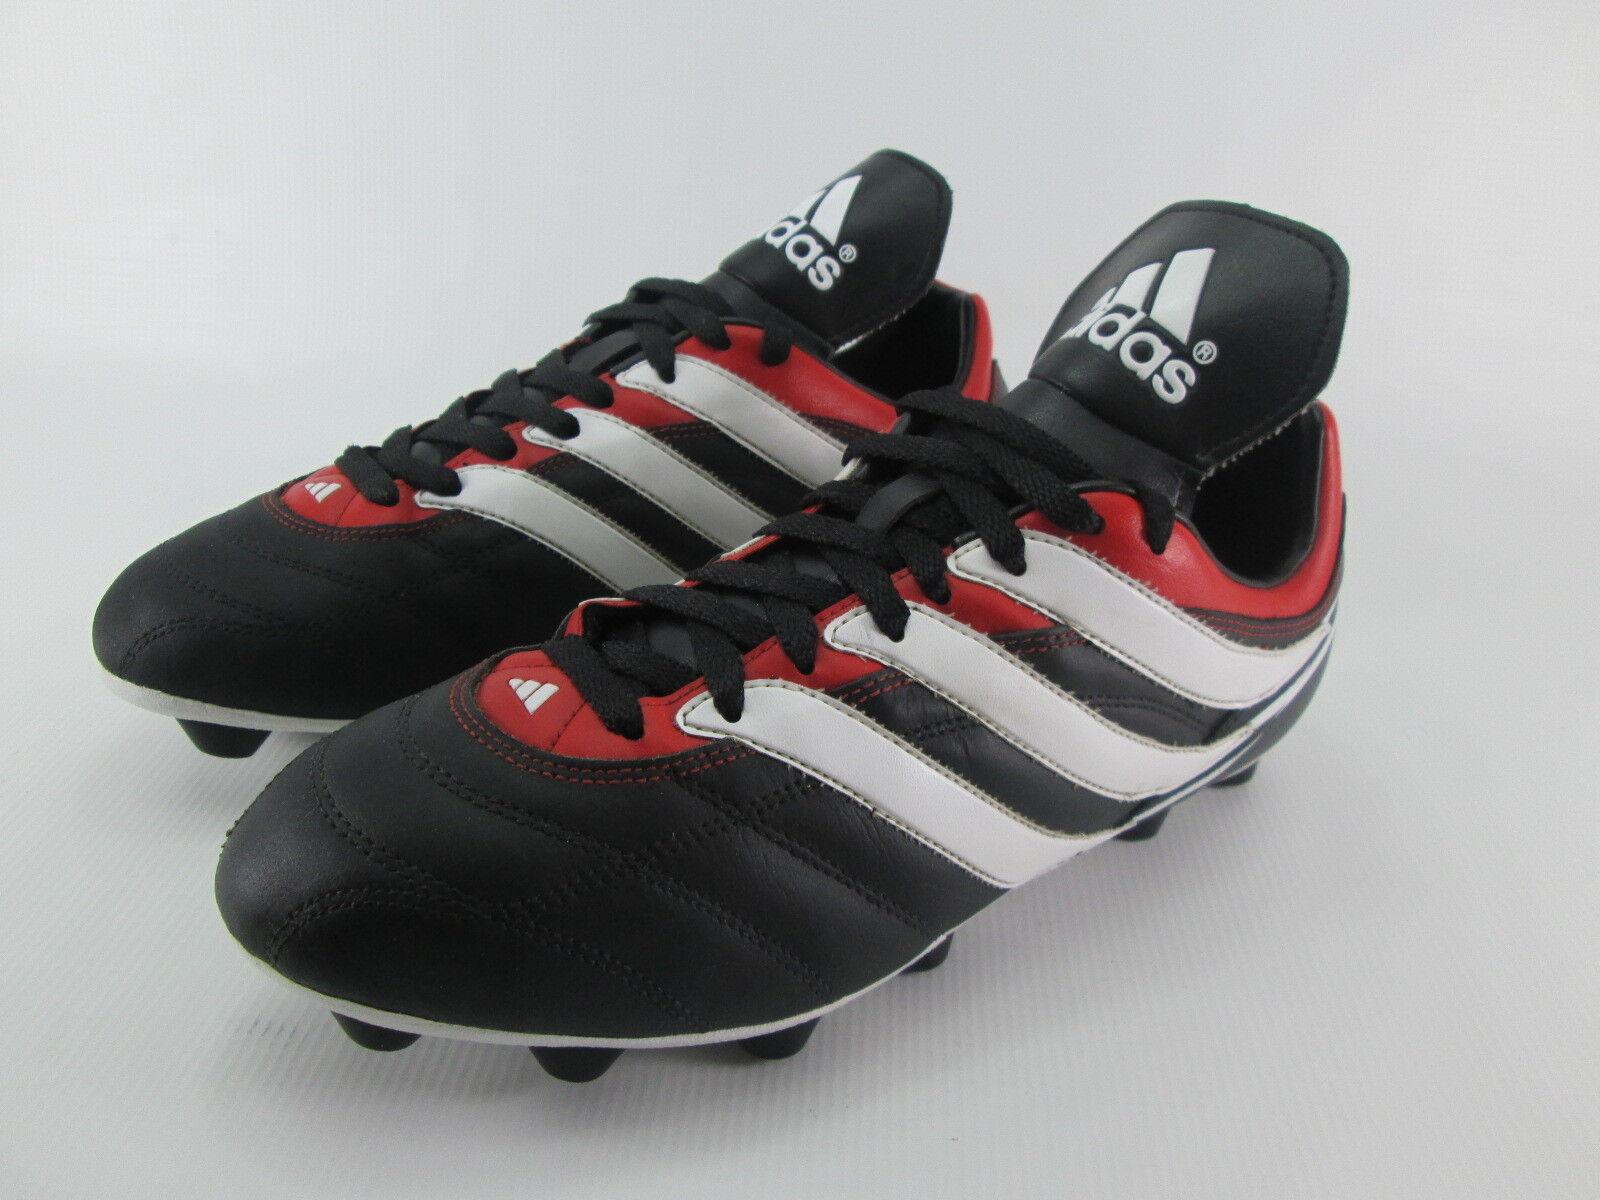 4831bfff3 Adidas Terreno Duro EQT Retro Football Boots Euro 2000 SIZE FR 42 JPN 26.5